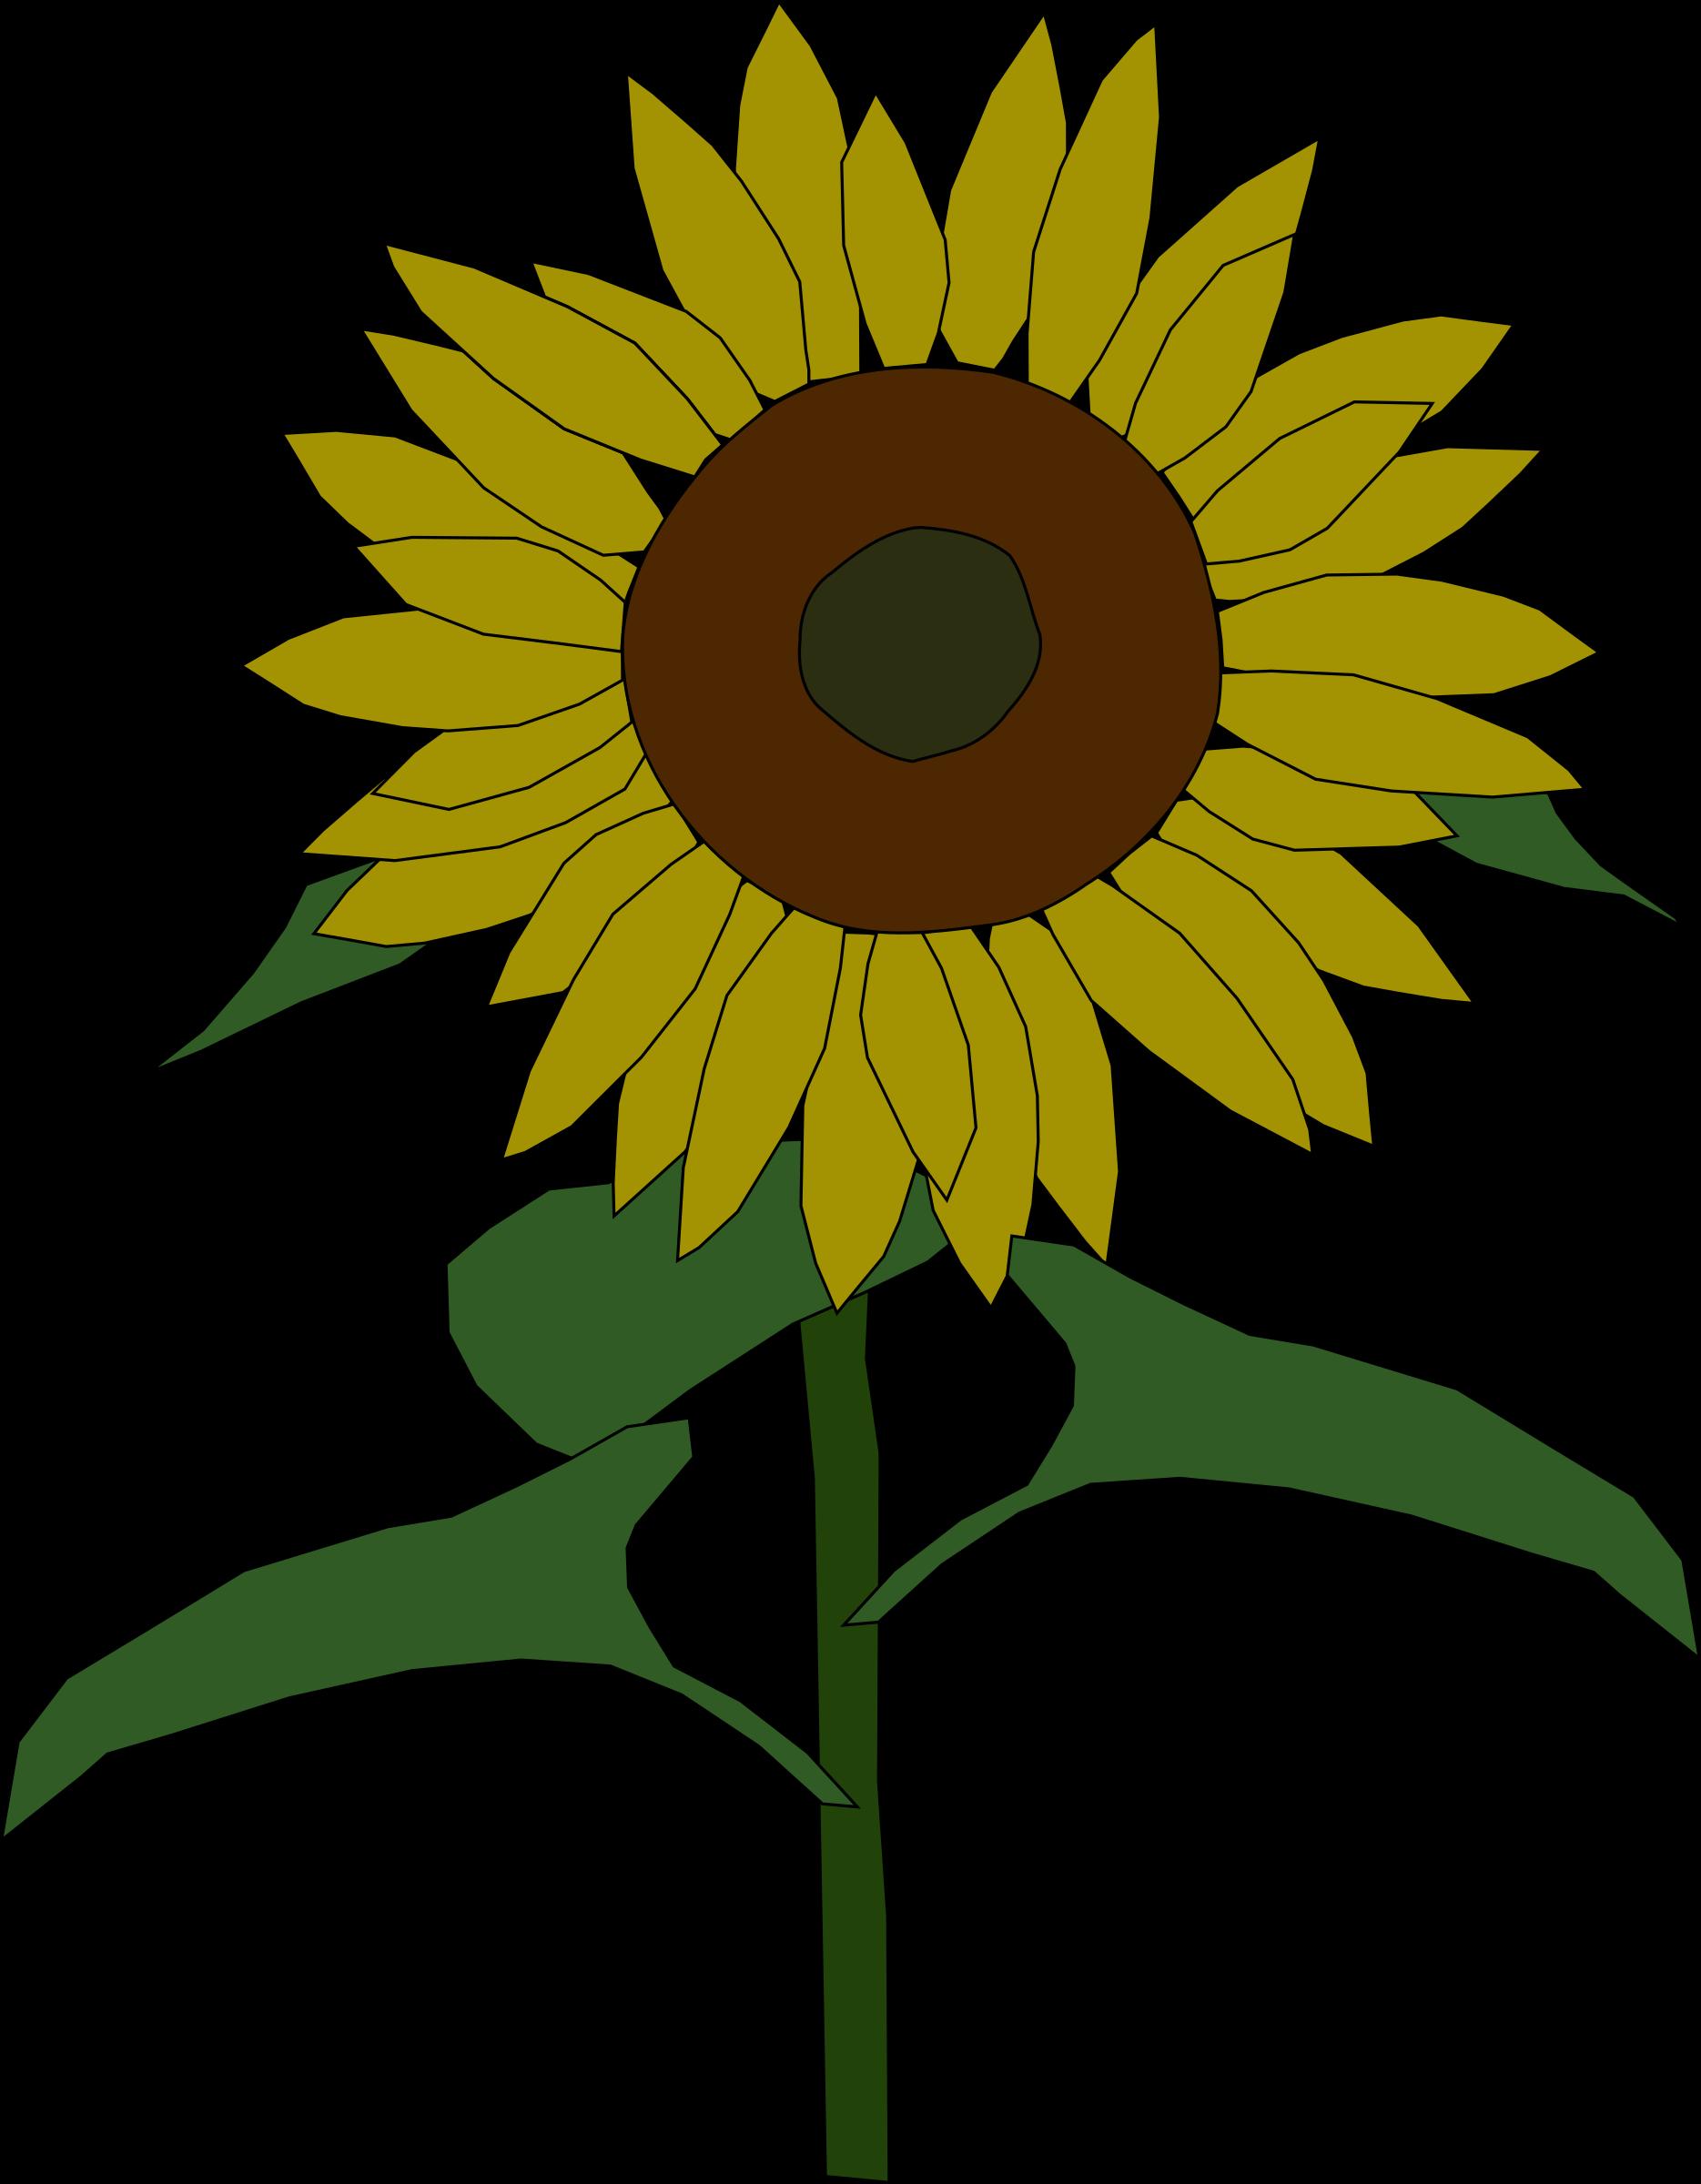 vector transparent download . Clipart sunflower